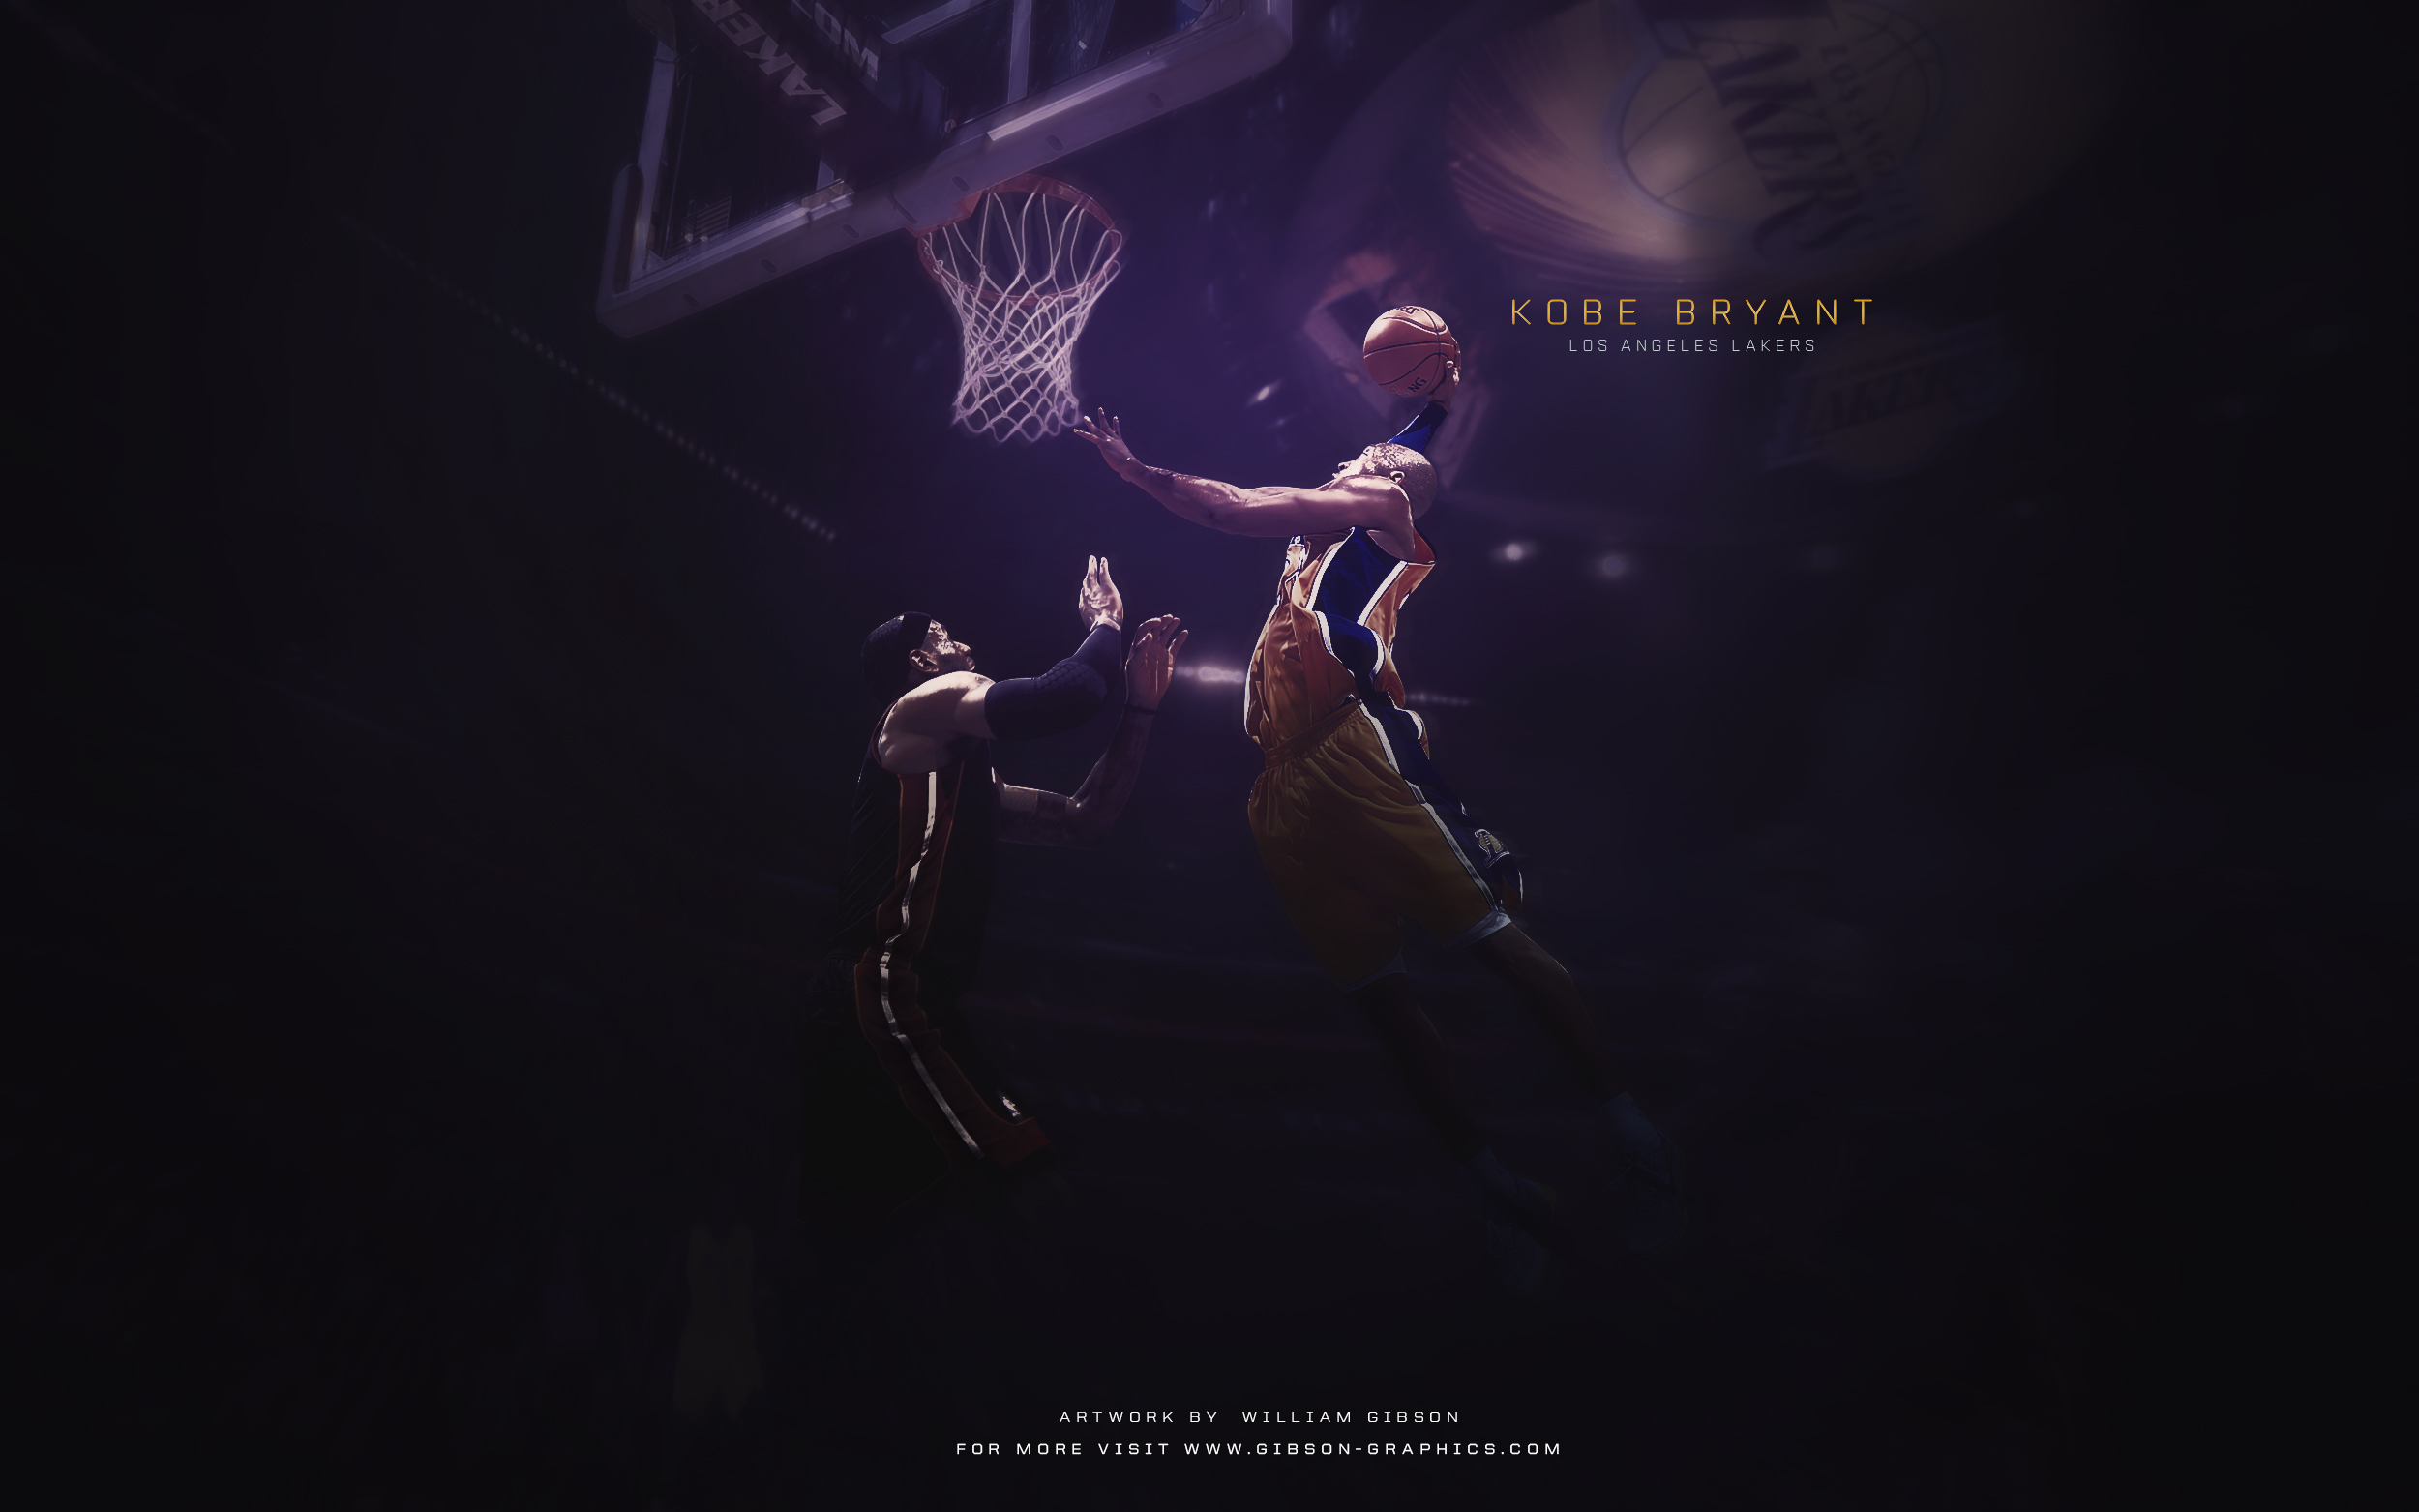 Kobe Bryant Dunk Artwork